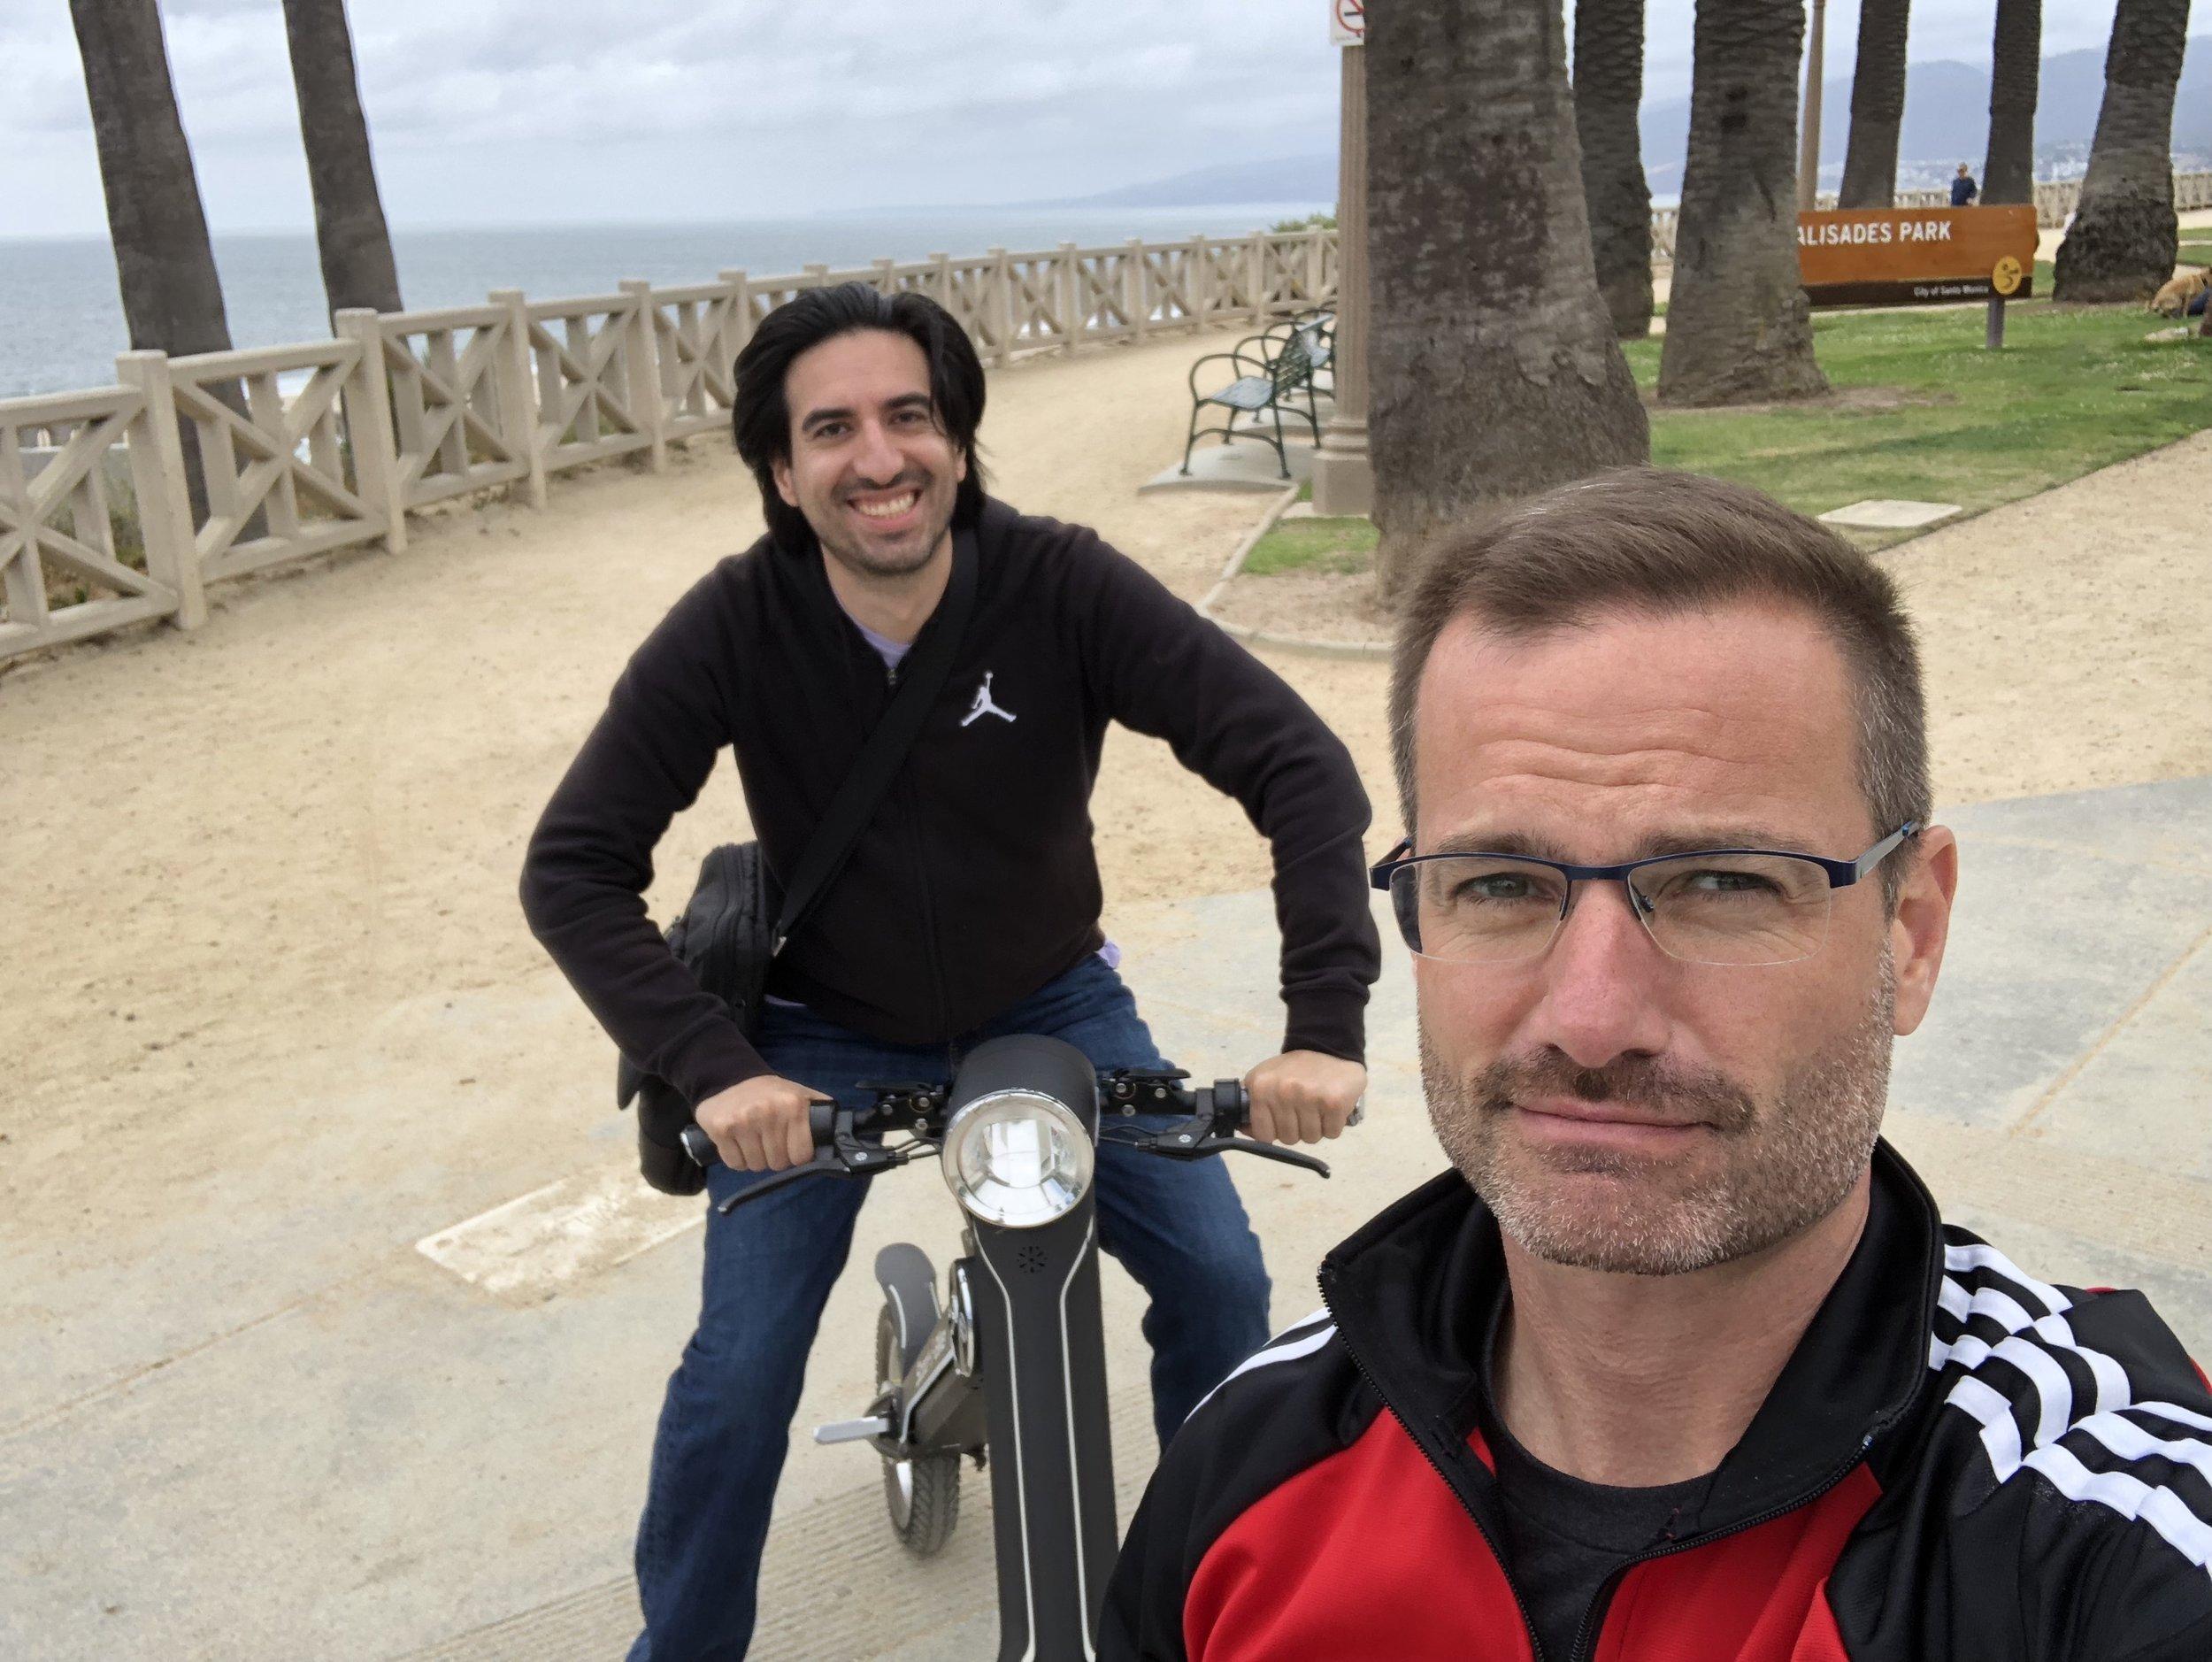 The Technorati had me try out a Scoot-E-Bike up the California Coast.